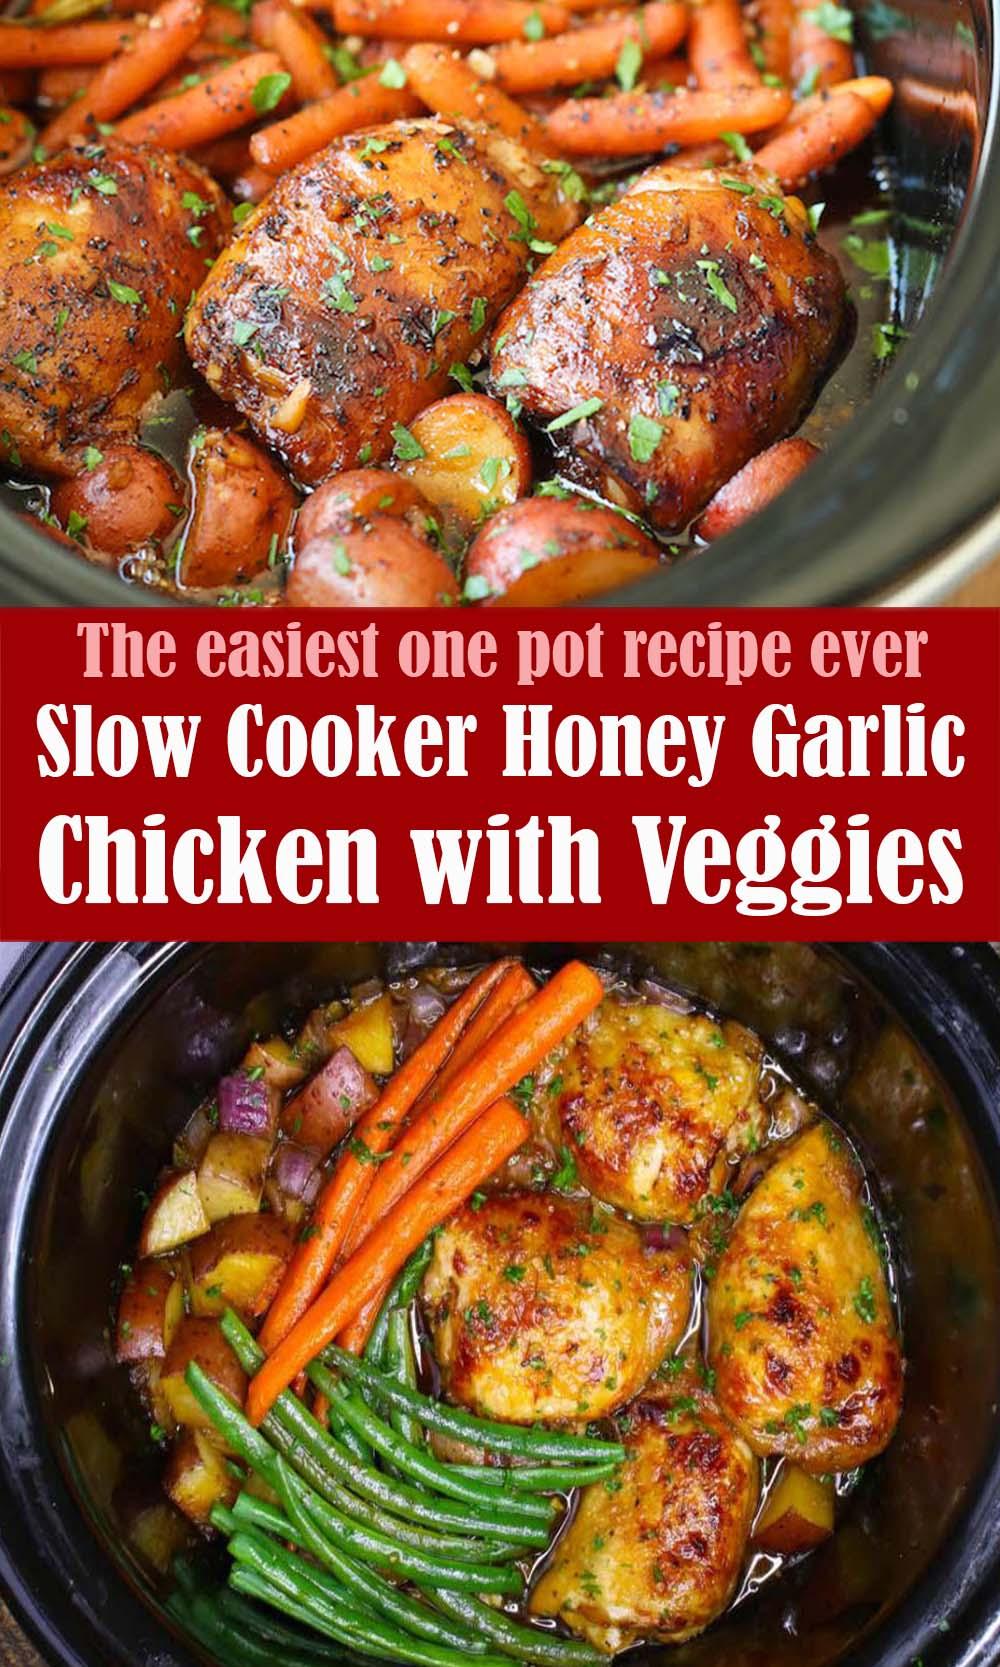 Slow Cooker Honey Garlic Chicken with Veggies Recipe